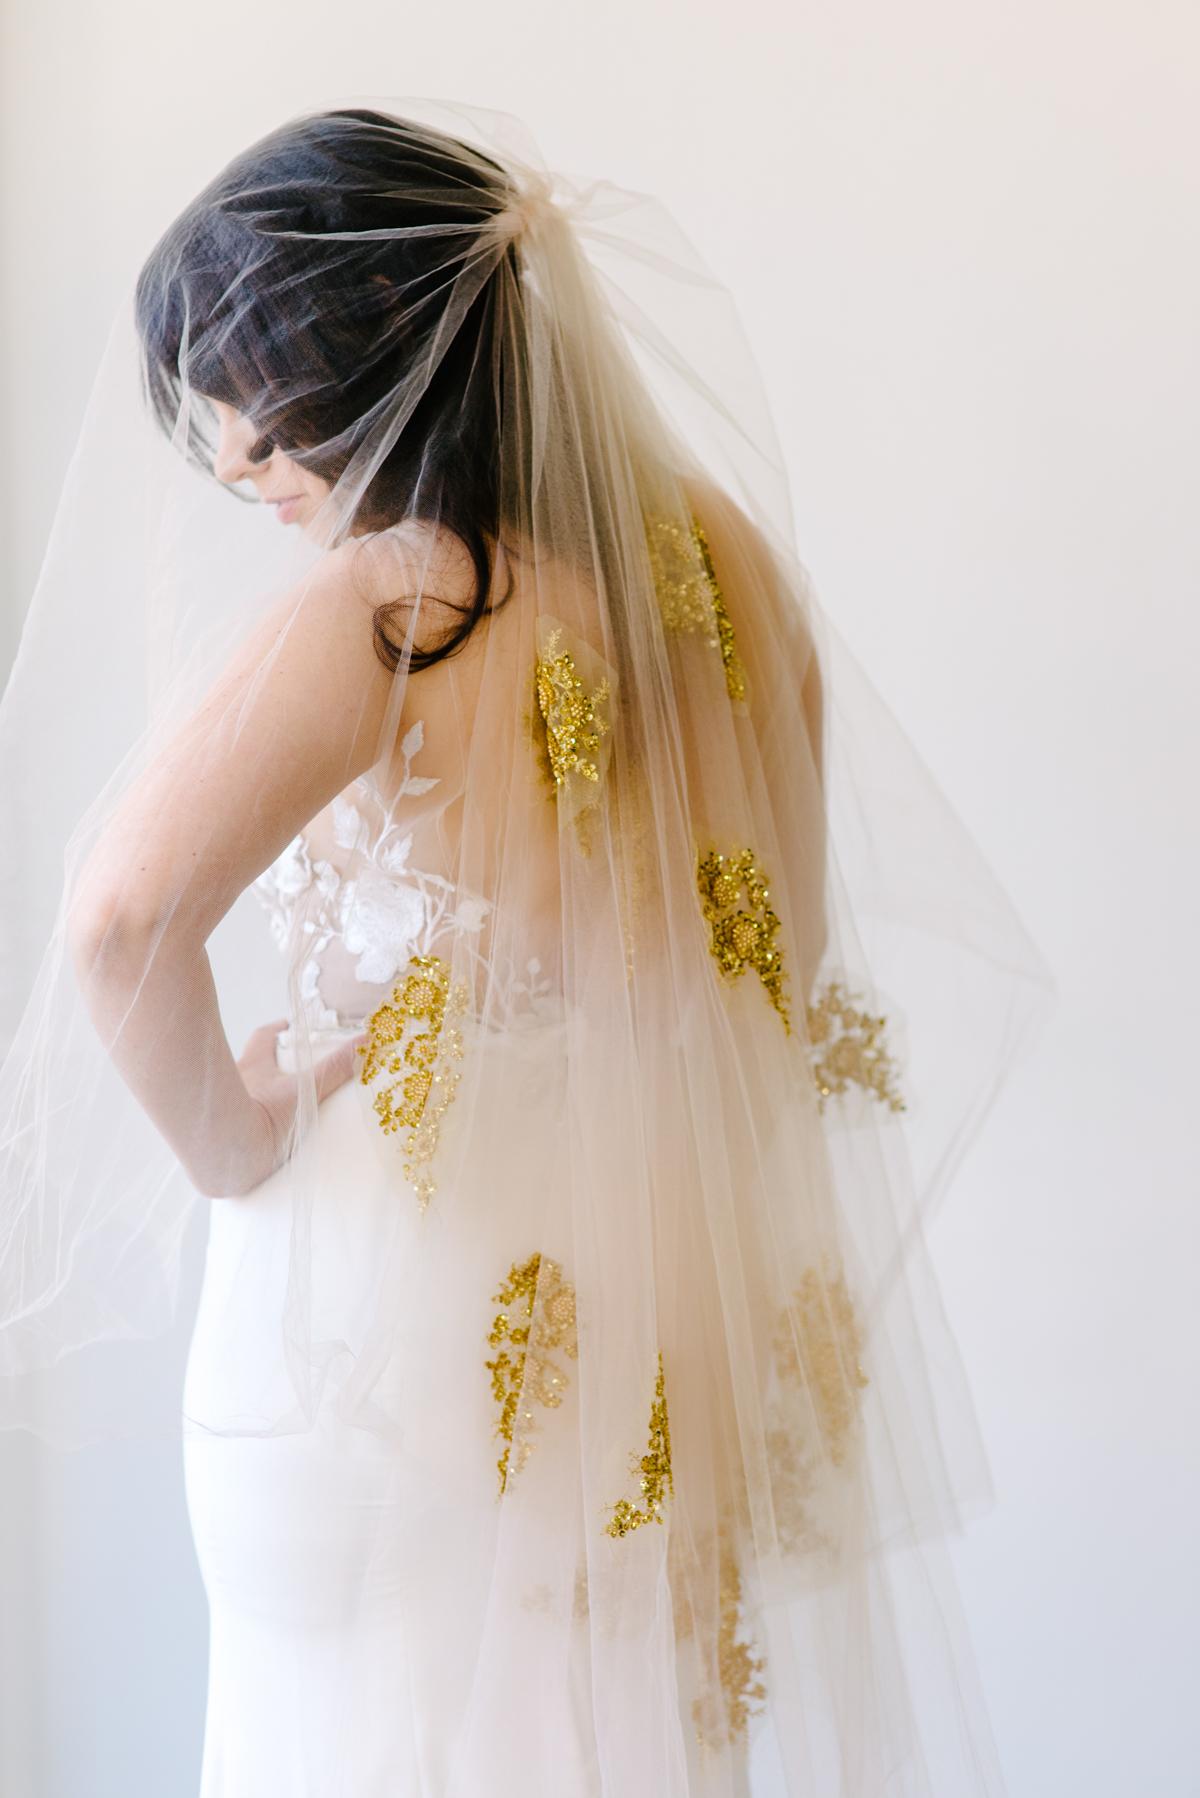 bride wearing veil with gold appliqués